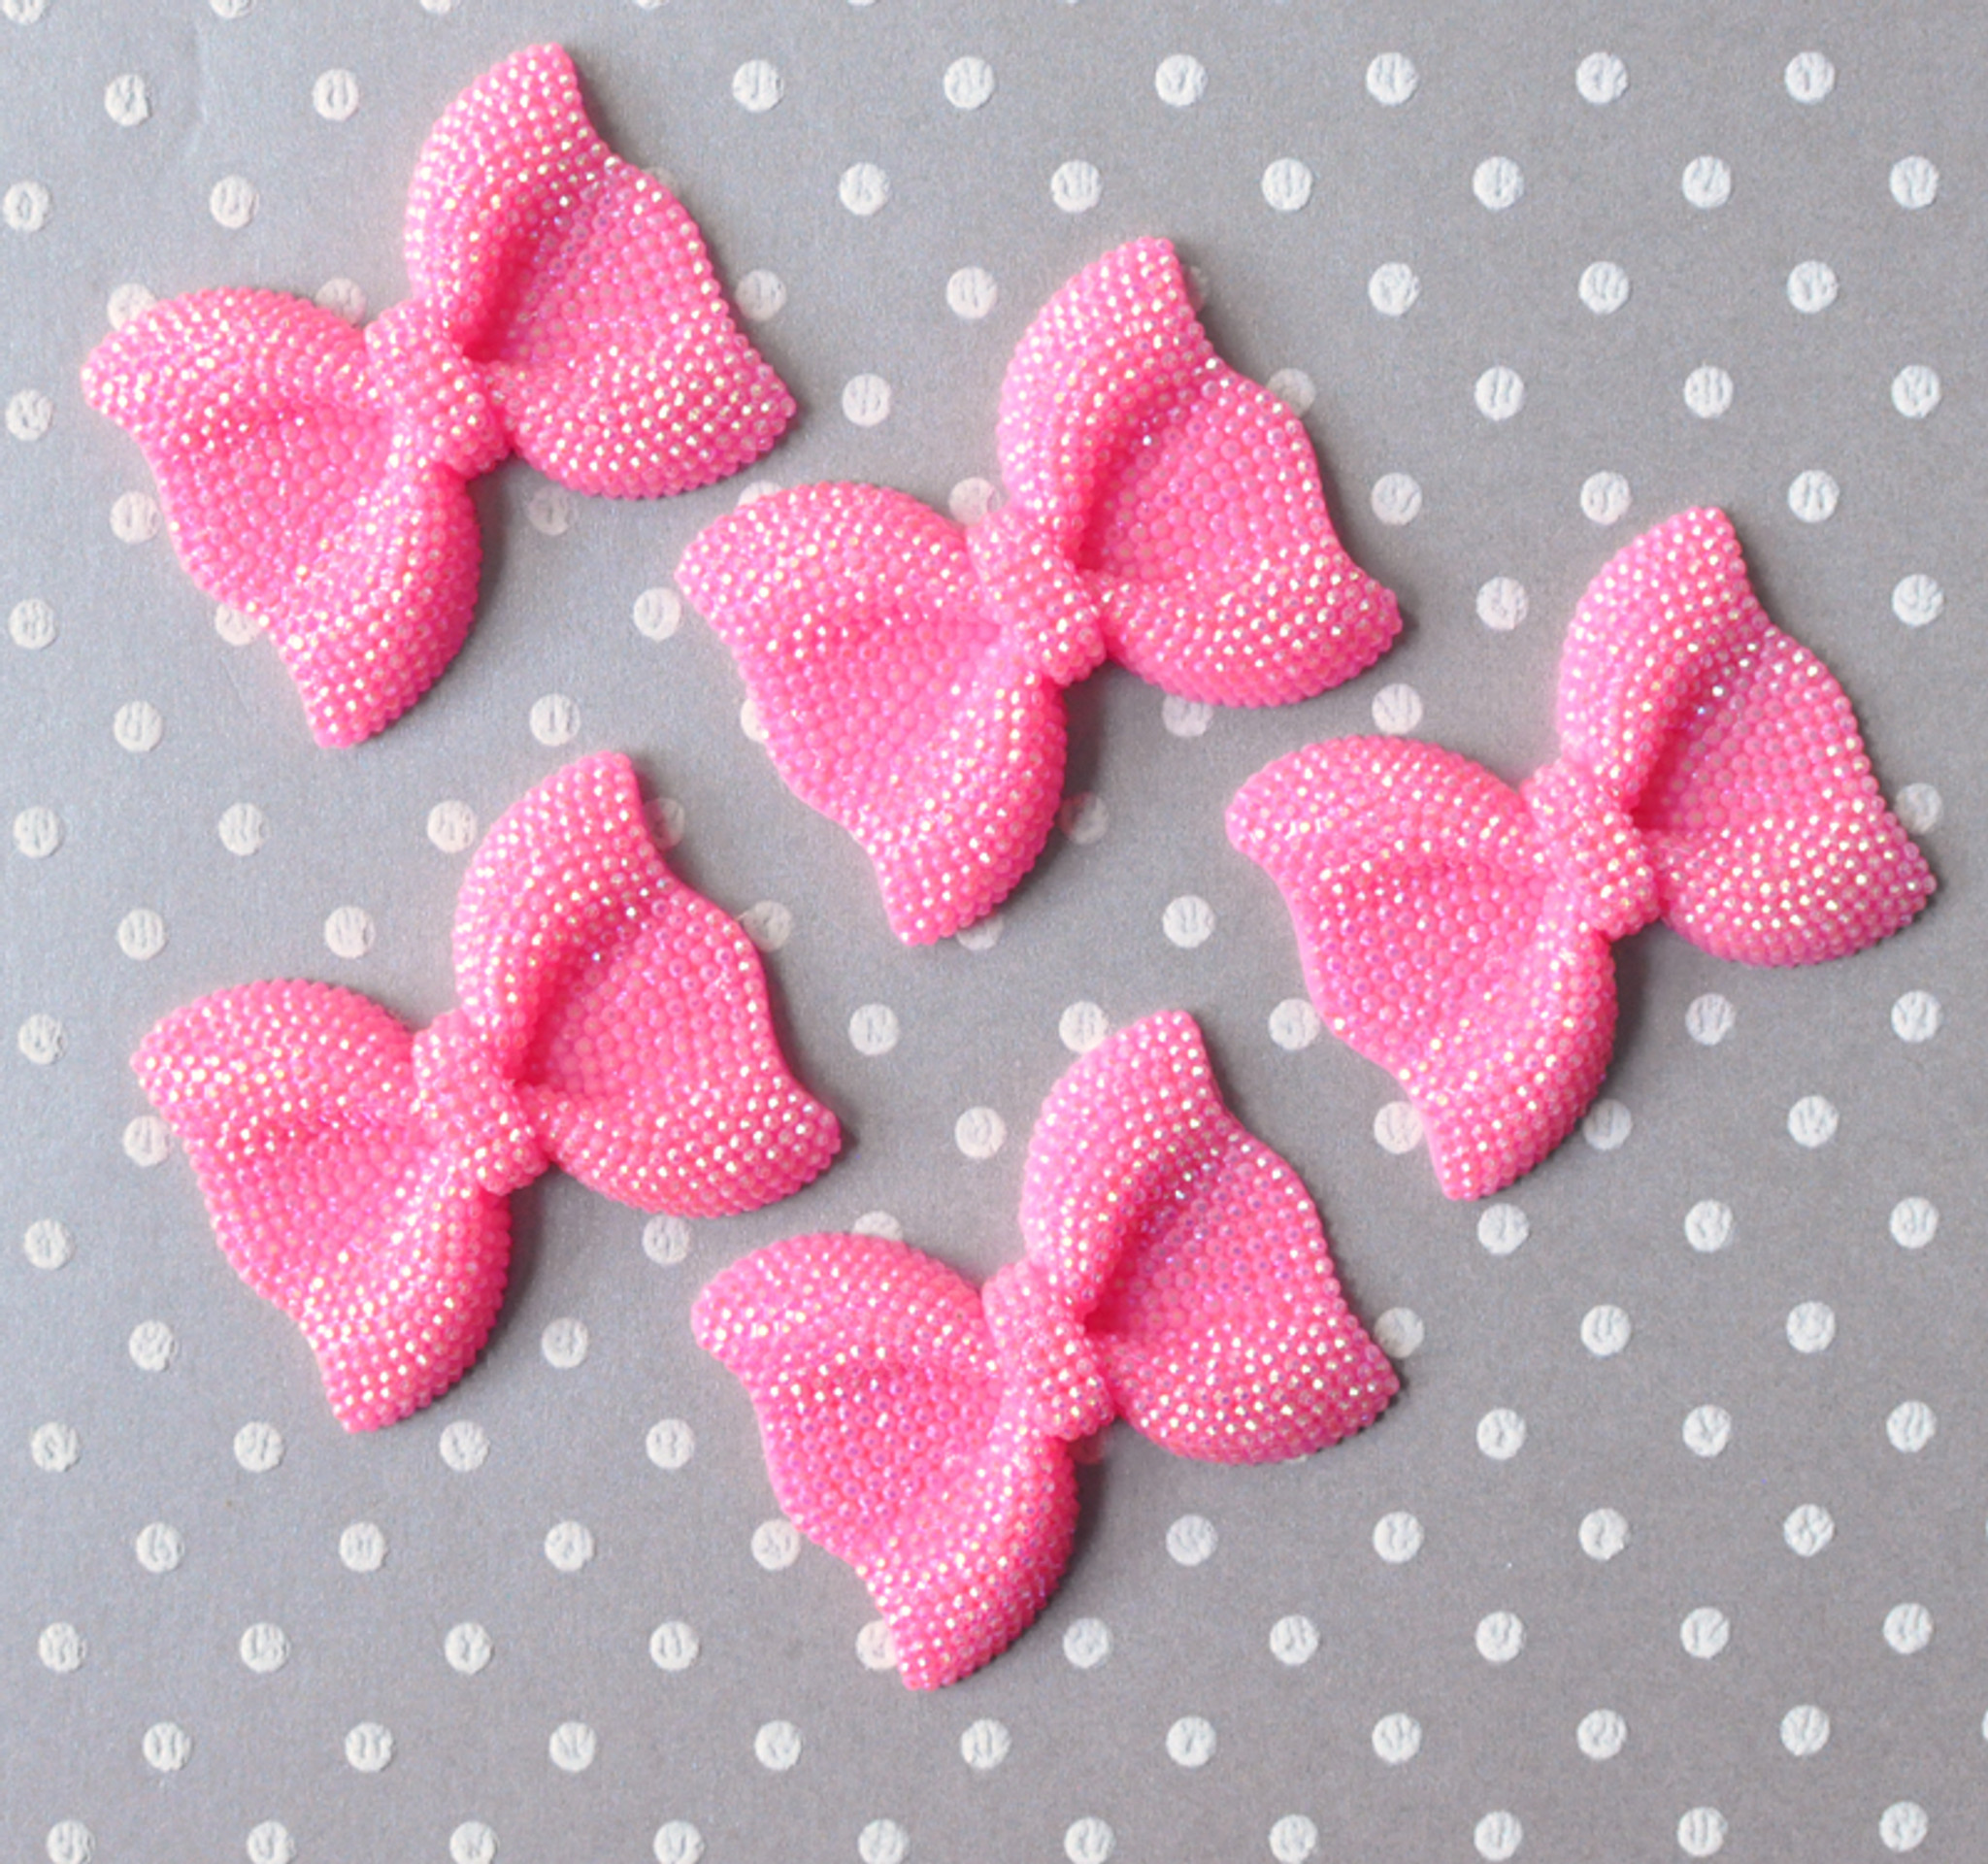 52mm Pink rhinestone bow beads